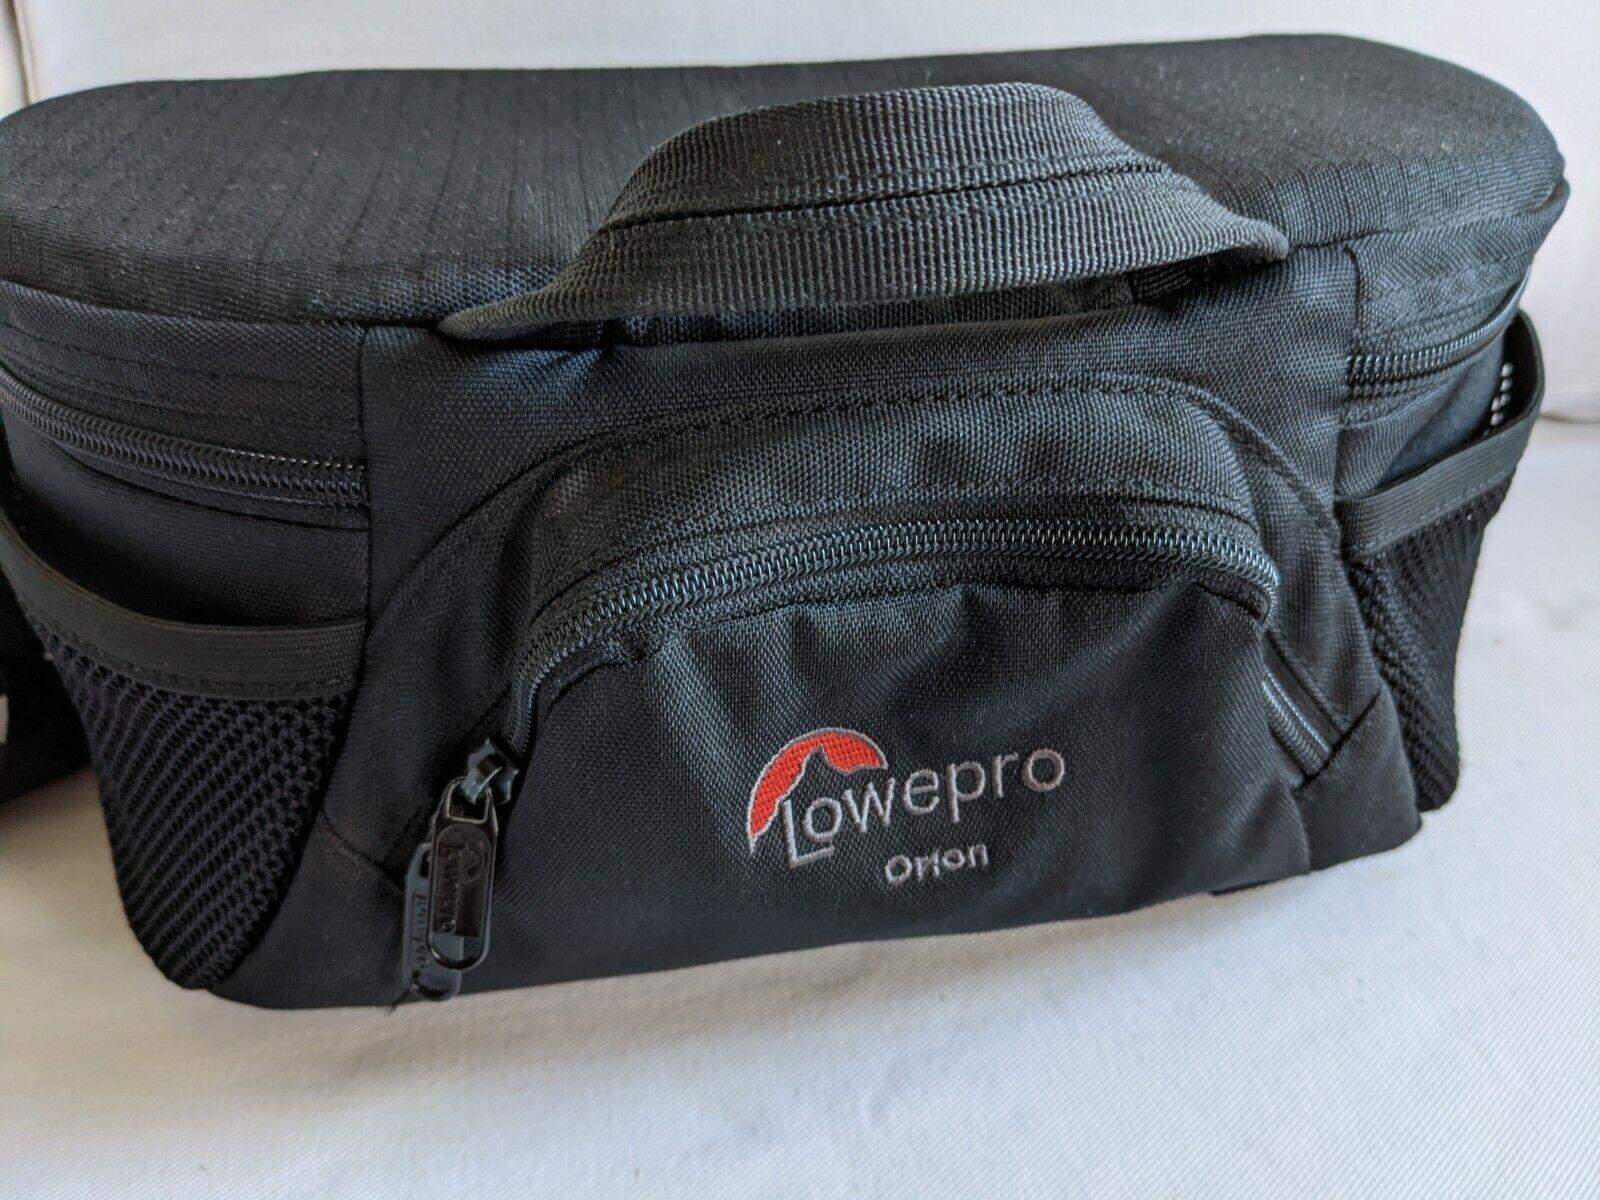 BLACK Lowepro Orion AW Camera Bag Photo Waist Bag